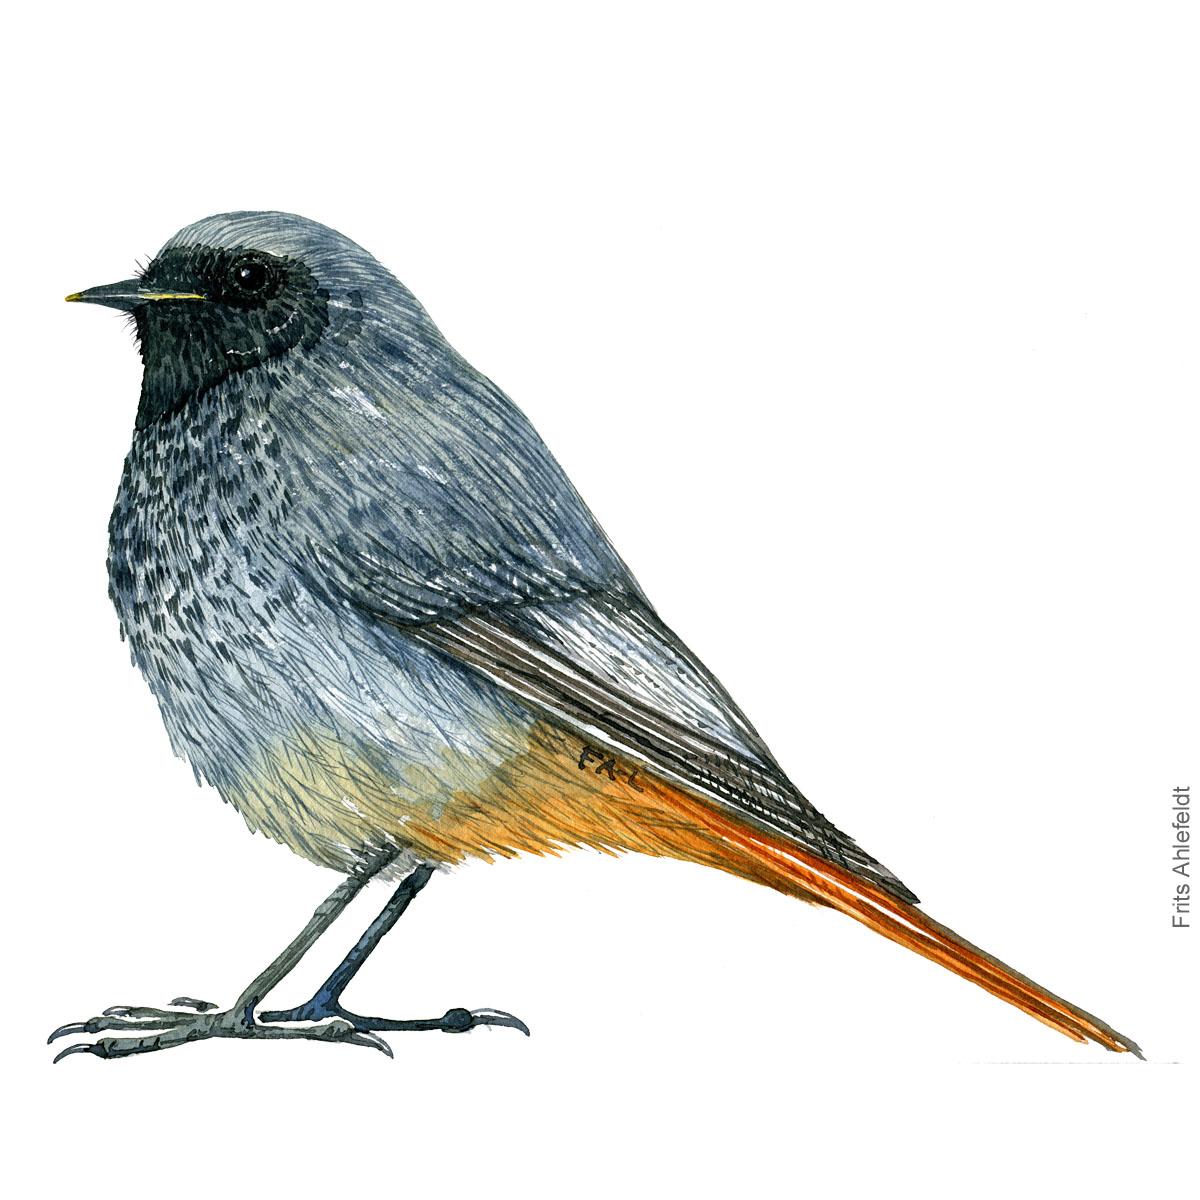 Husrødstjert - Black redstart bird watercolor illustration. Artwork by Frits Ahlefeldt. Fugle akvarel